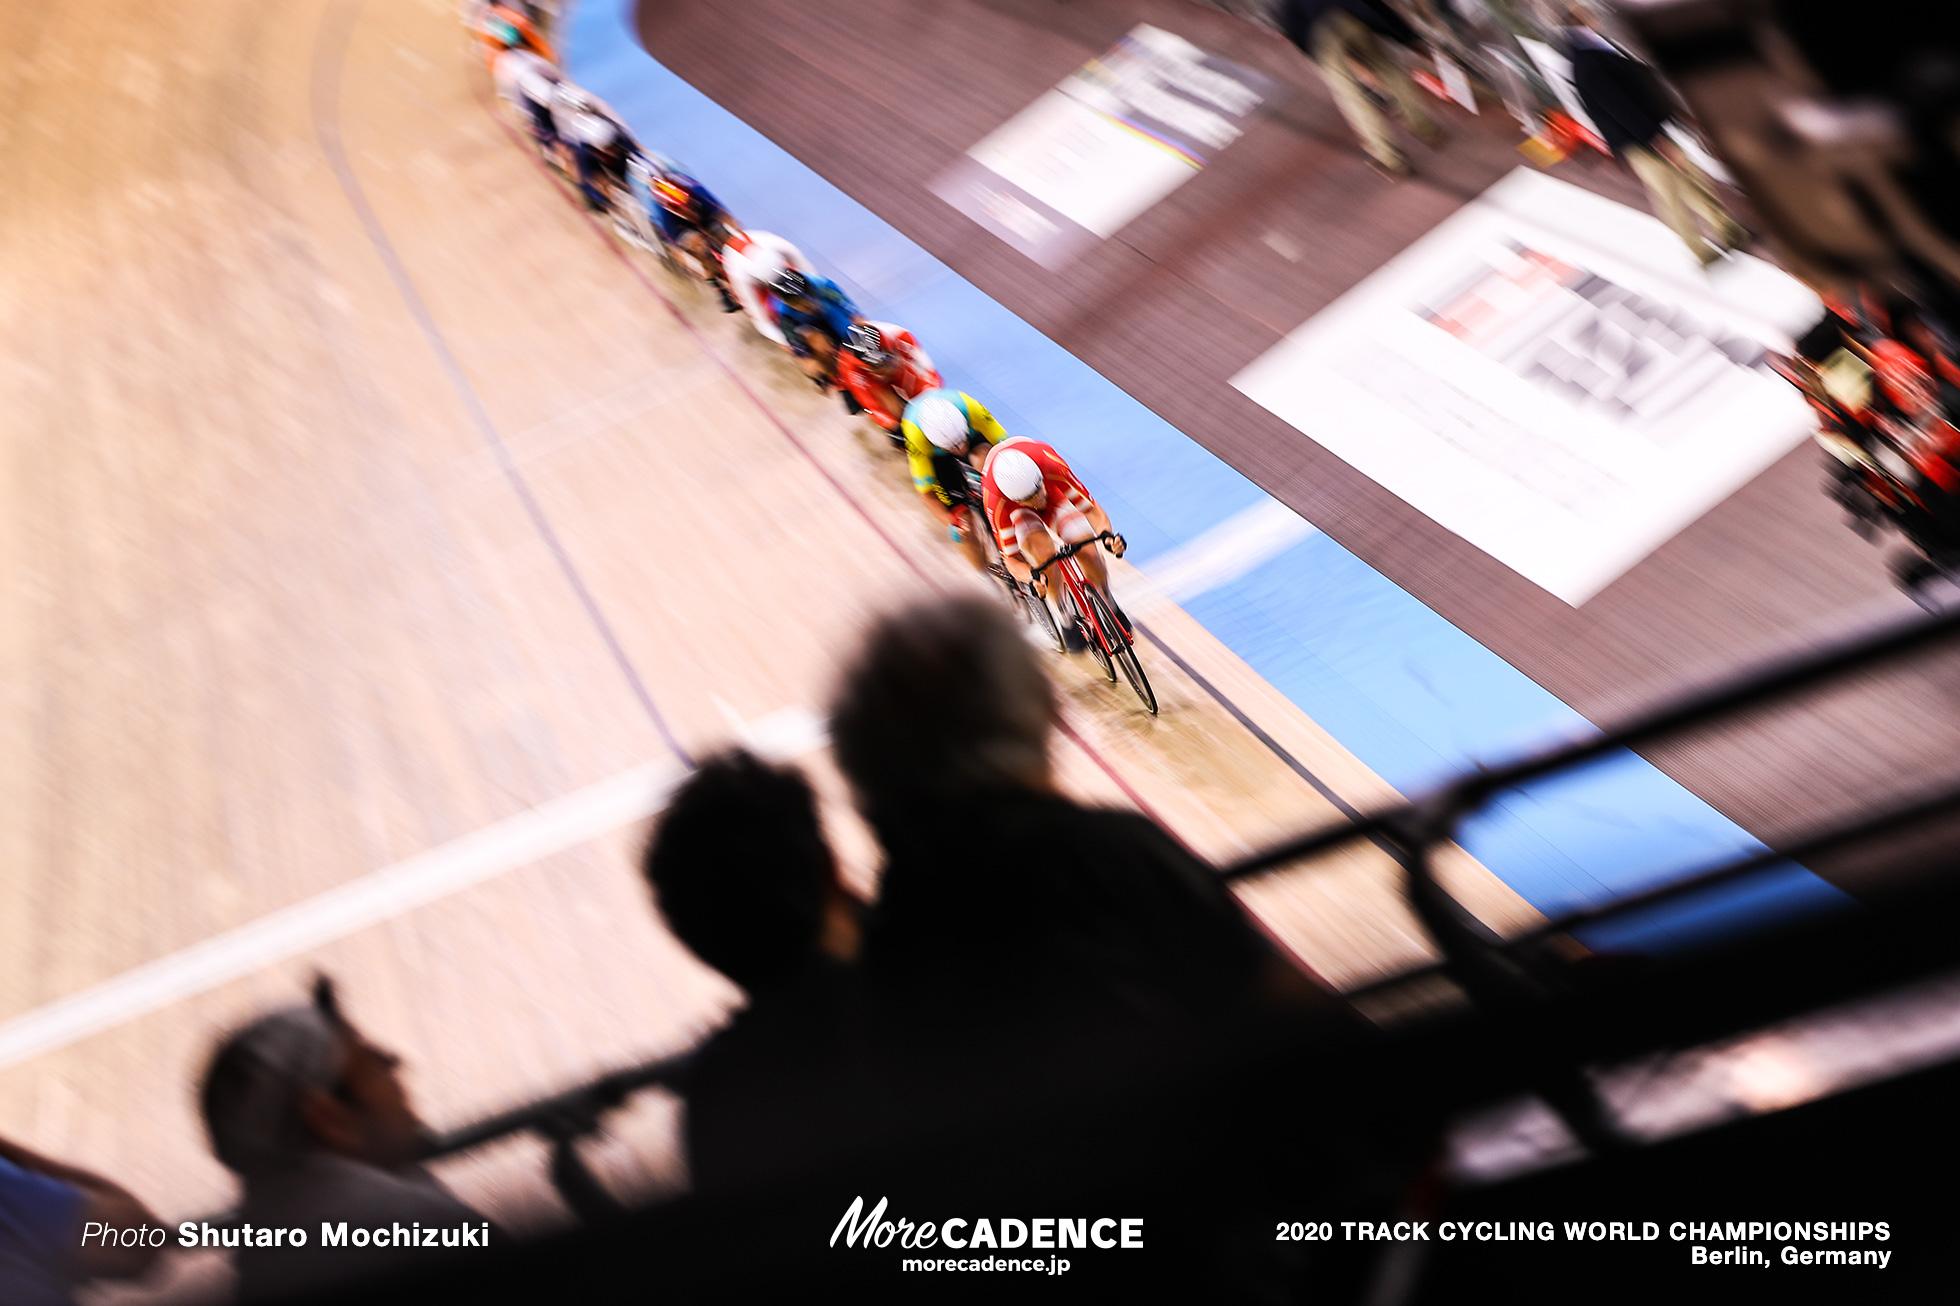 Point Race / Men's Omnium / 2020 Track Cycling World Championships, Lassse Norman Hansen ラッセ・ノーマン・ハンセン